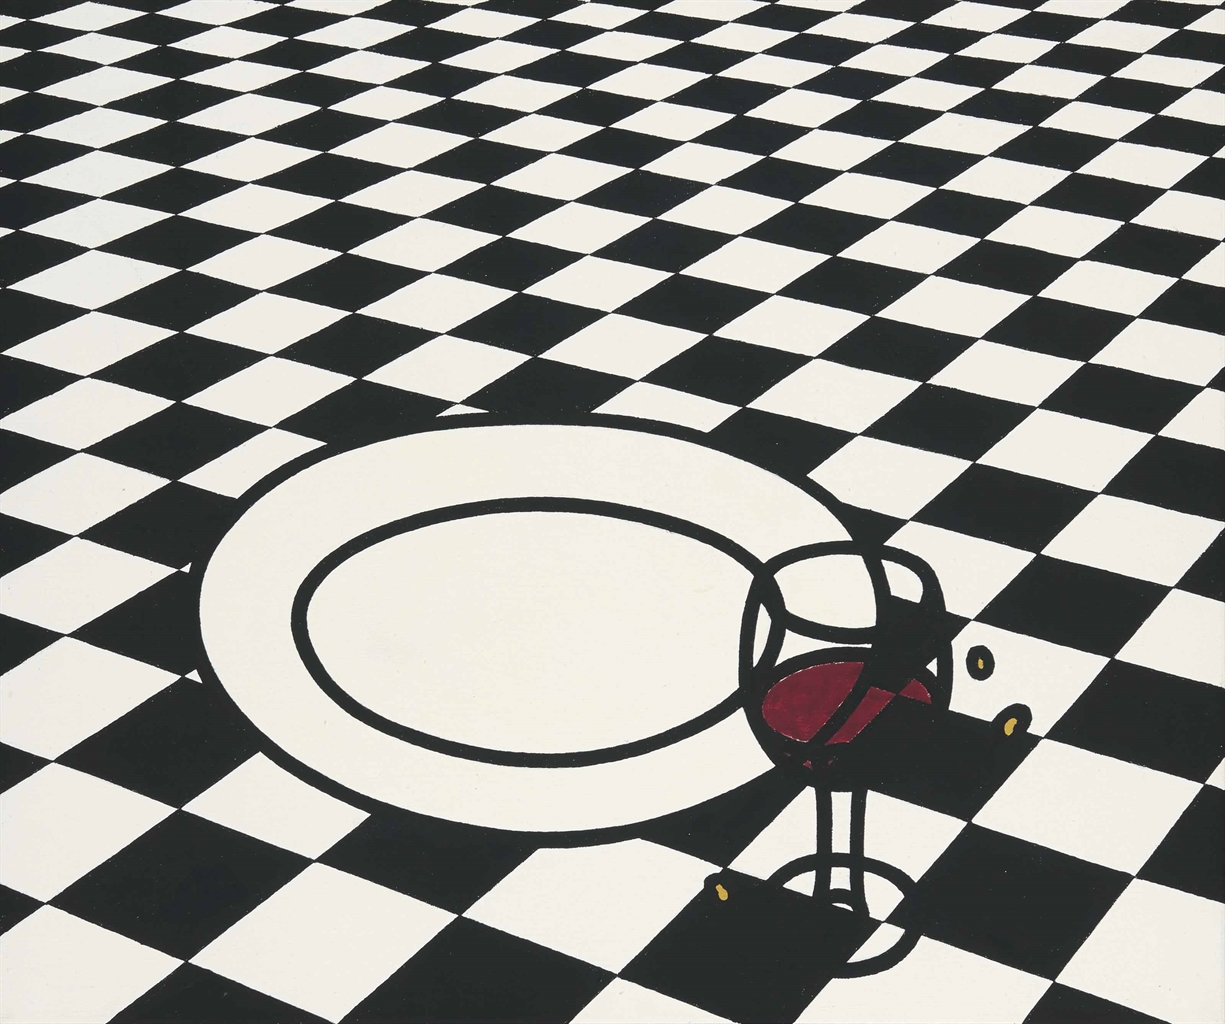 Patrick Caulfield-Glass & Plate, Black & White Checks-1972